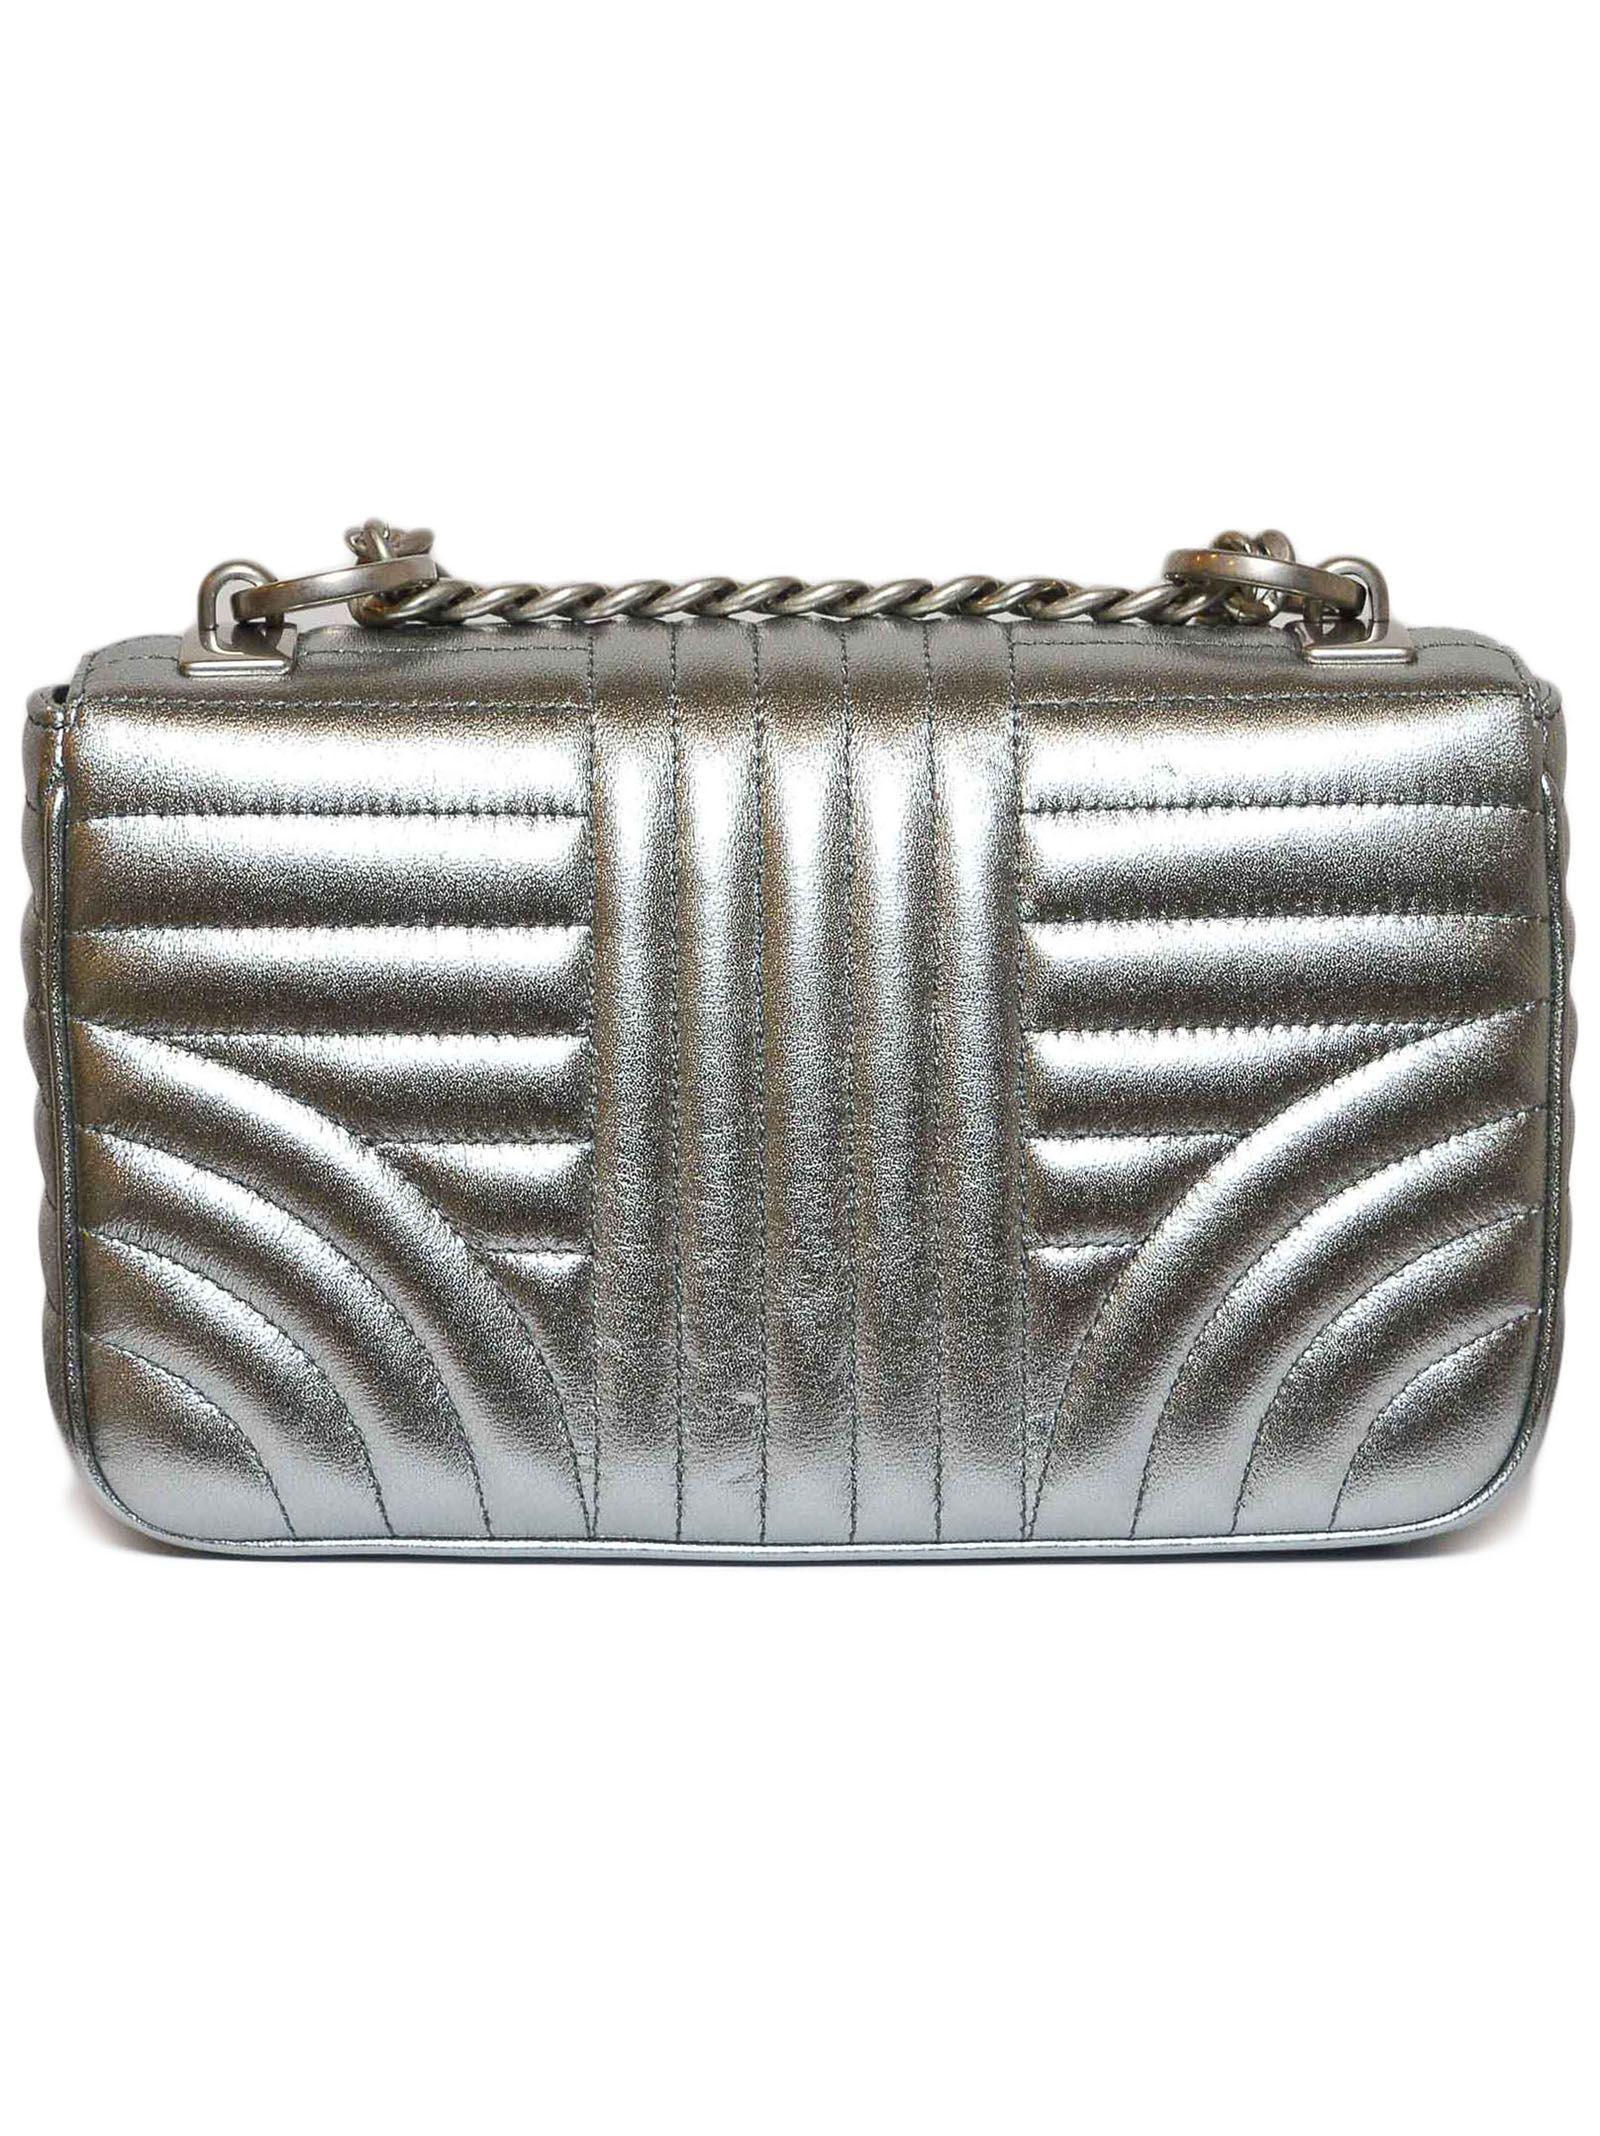 b53fb10cfe Lyst - Prada Women s Silver Leather Shoulder Bag in Metallic